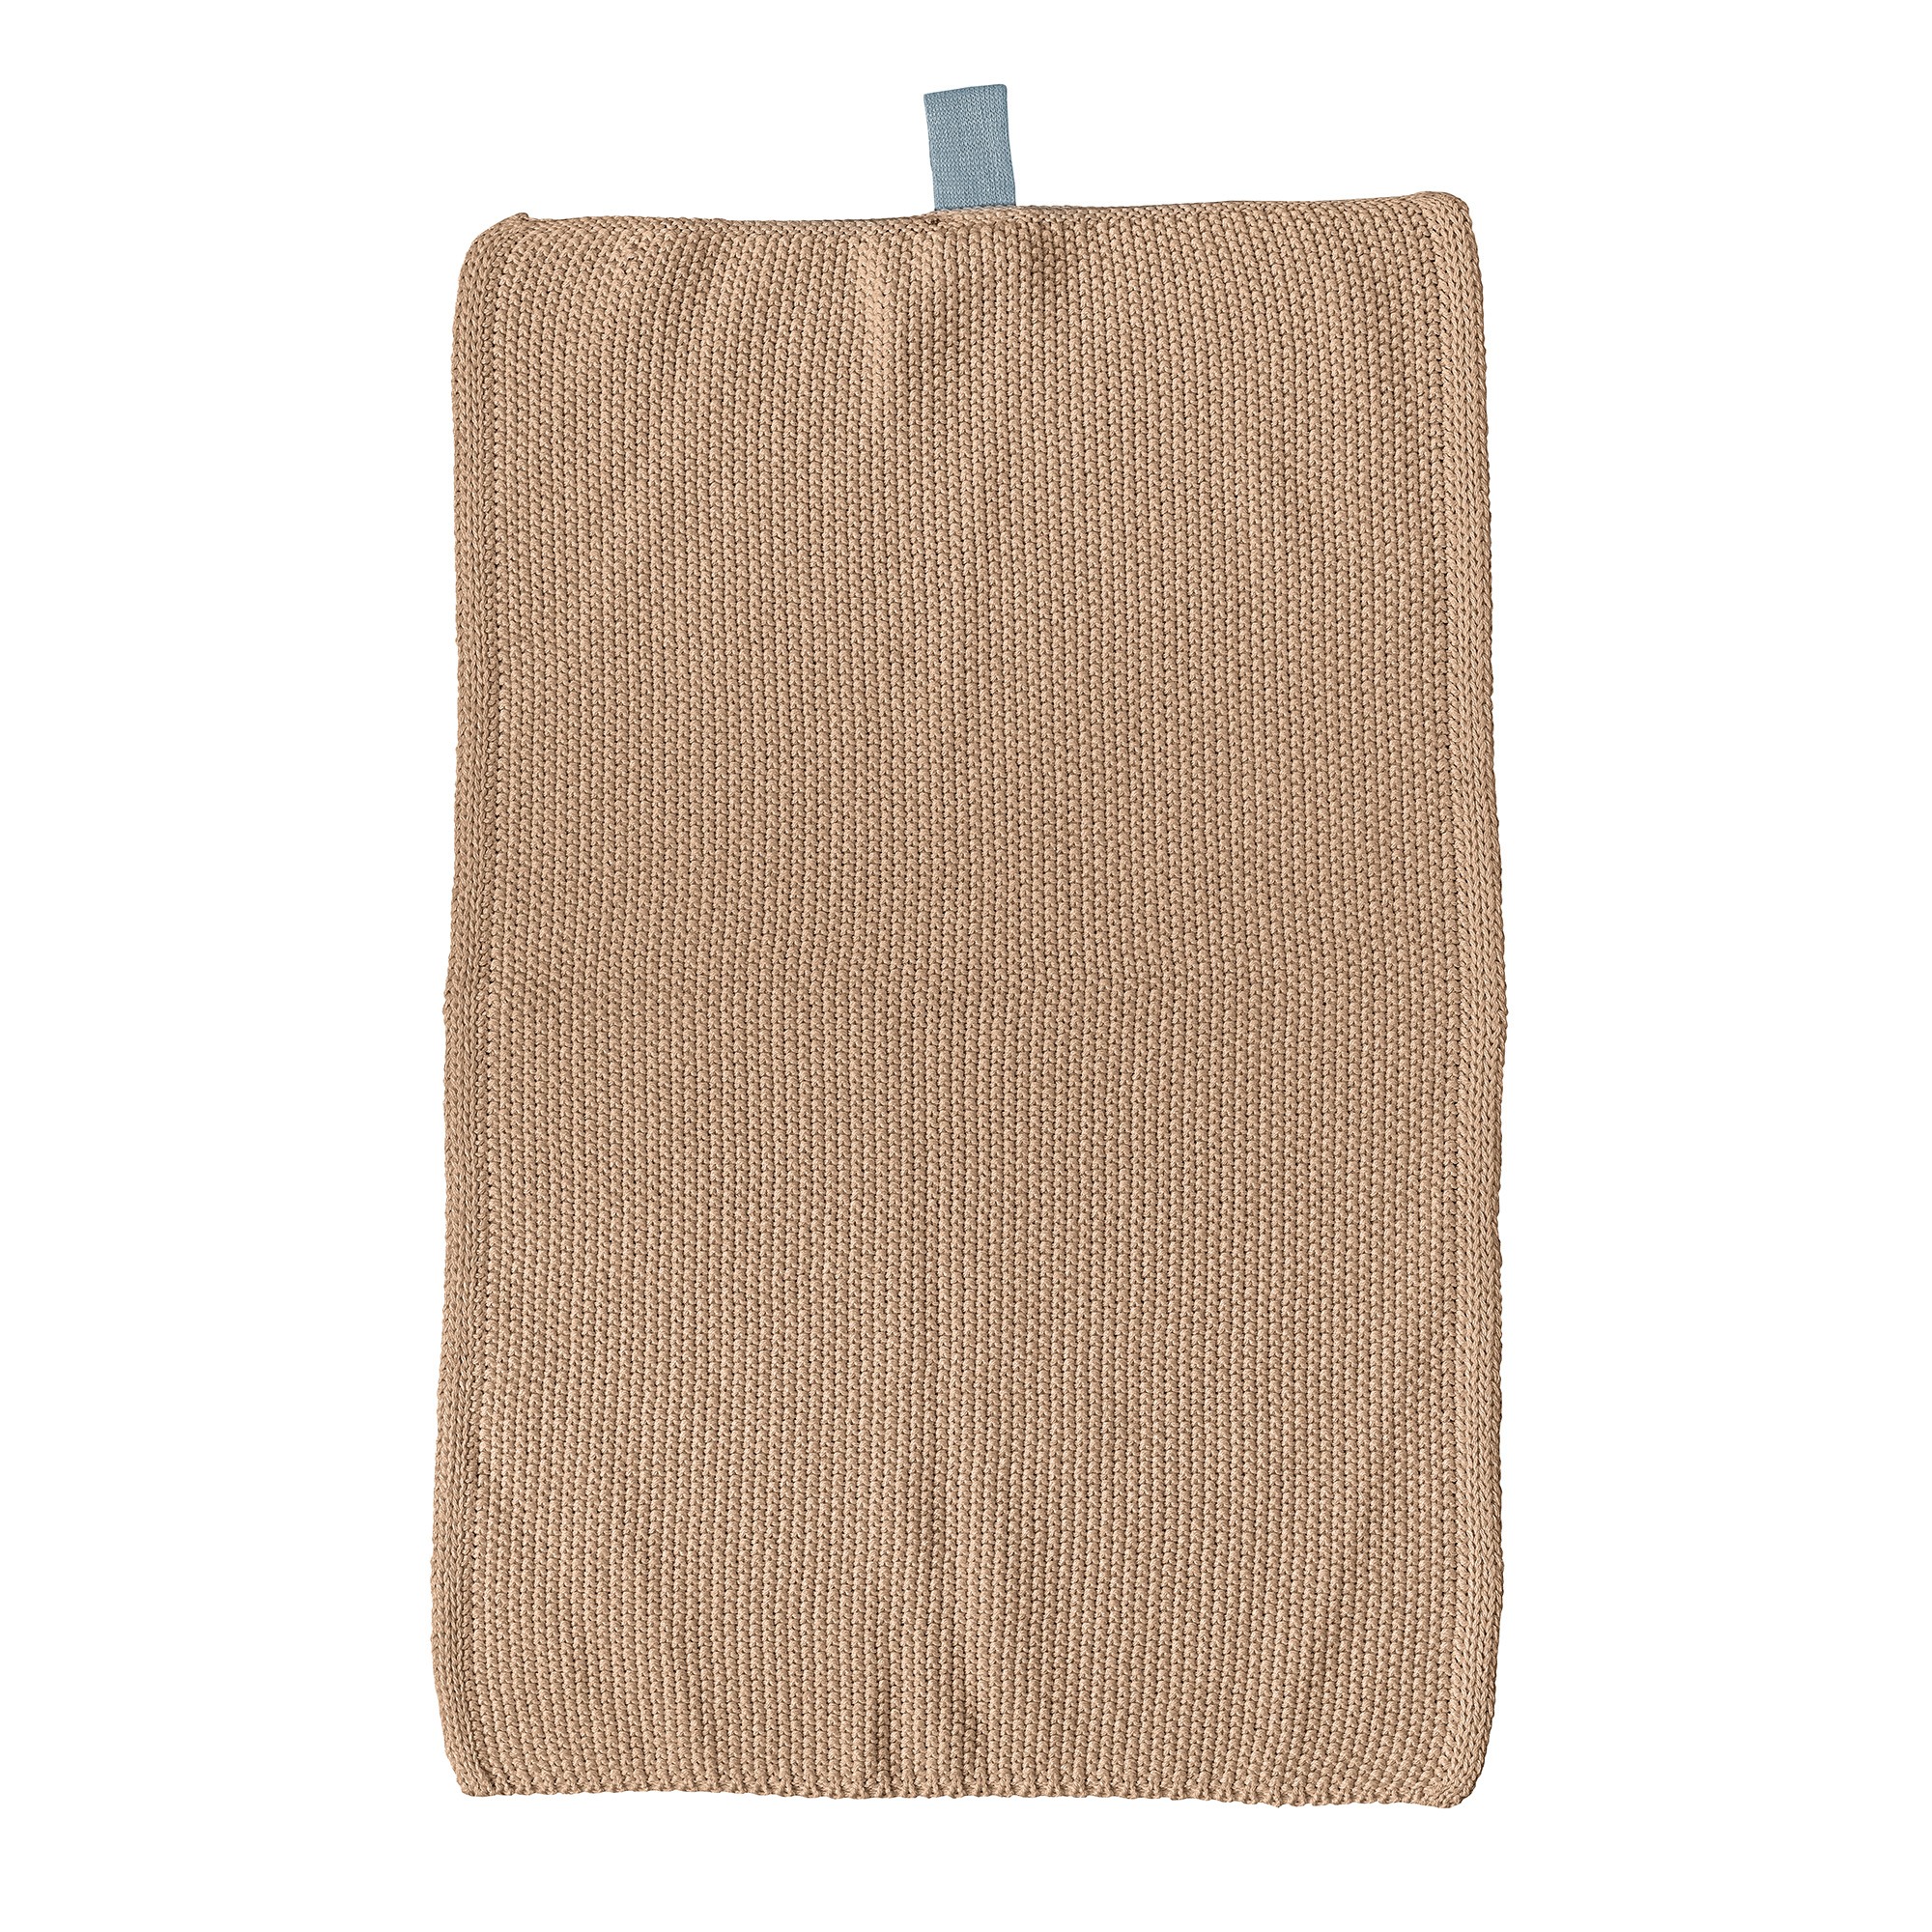 Cotton knit kitchen towel